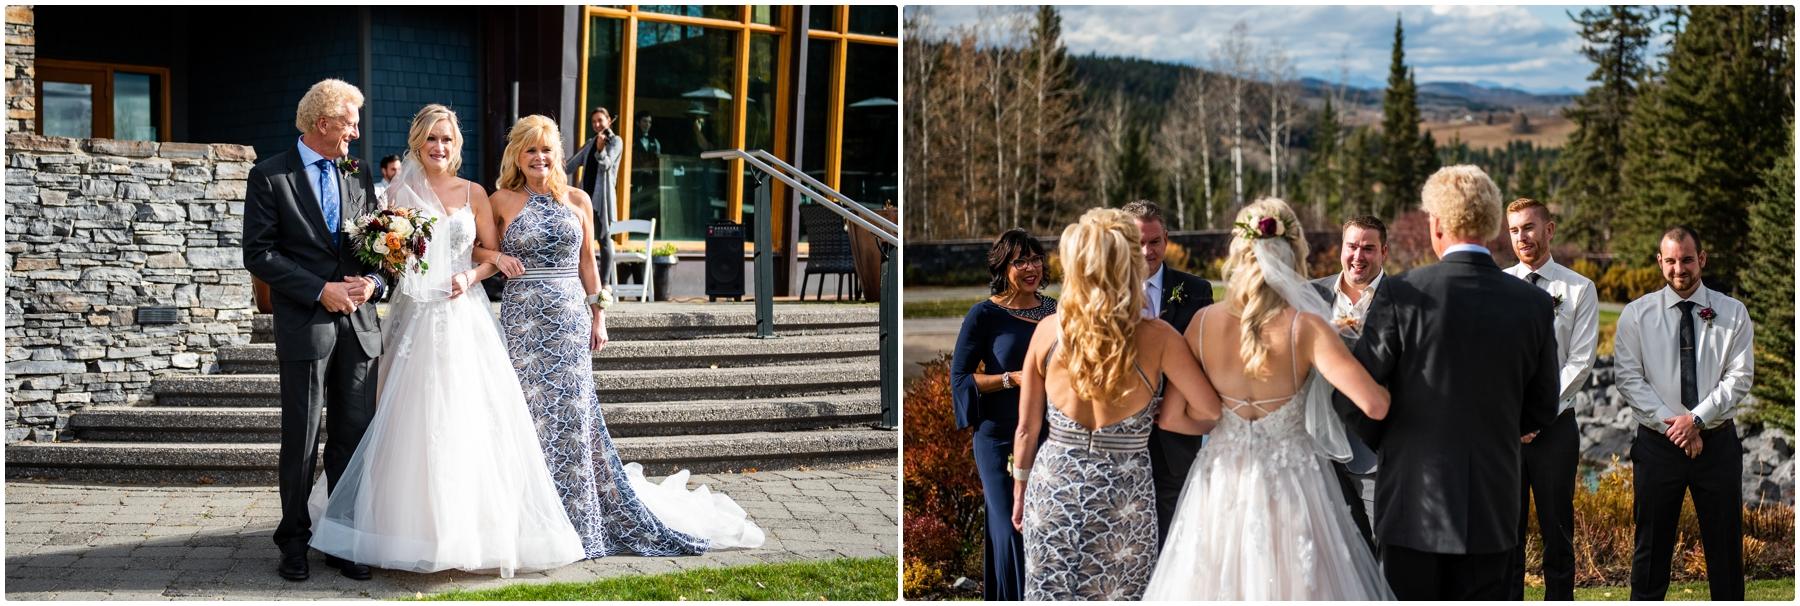 Autumn Azuridge Estate Hotel Wedding Outdoor Ceremony Photographer - Azuridge Estate Hotel Wedding